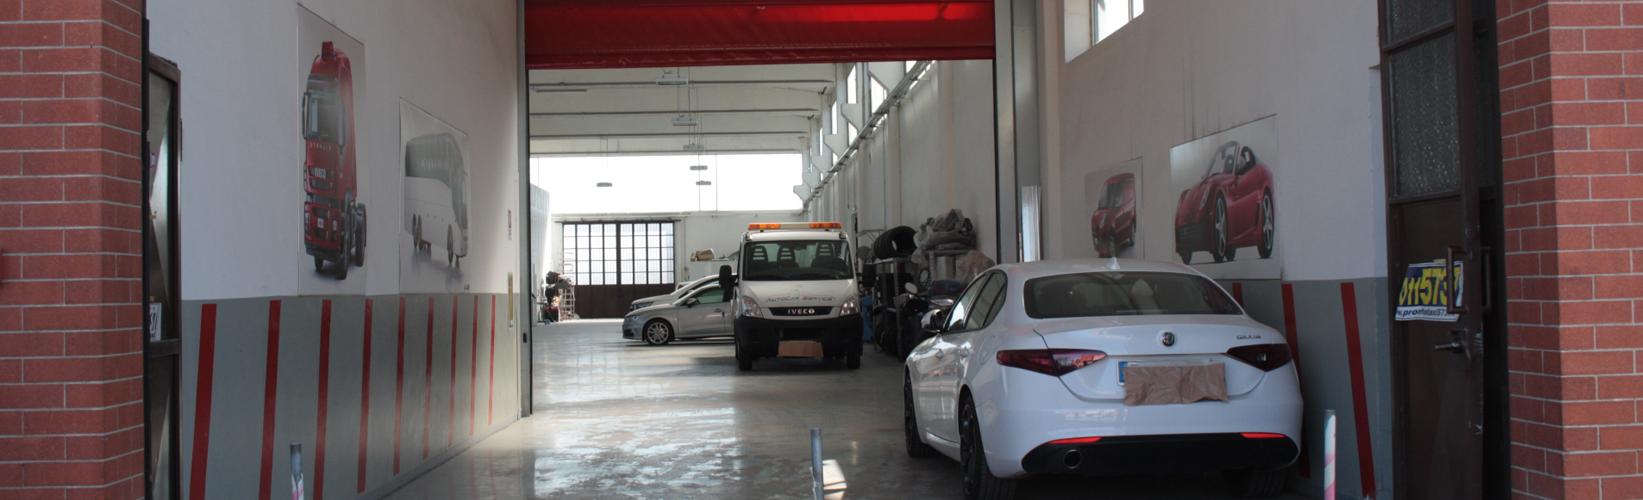 Servizi per auto, camper, furgoni e mezzi pesanti